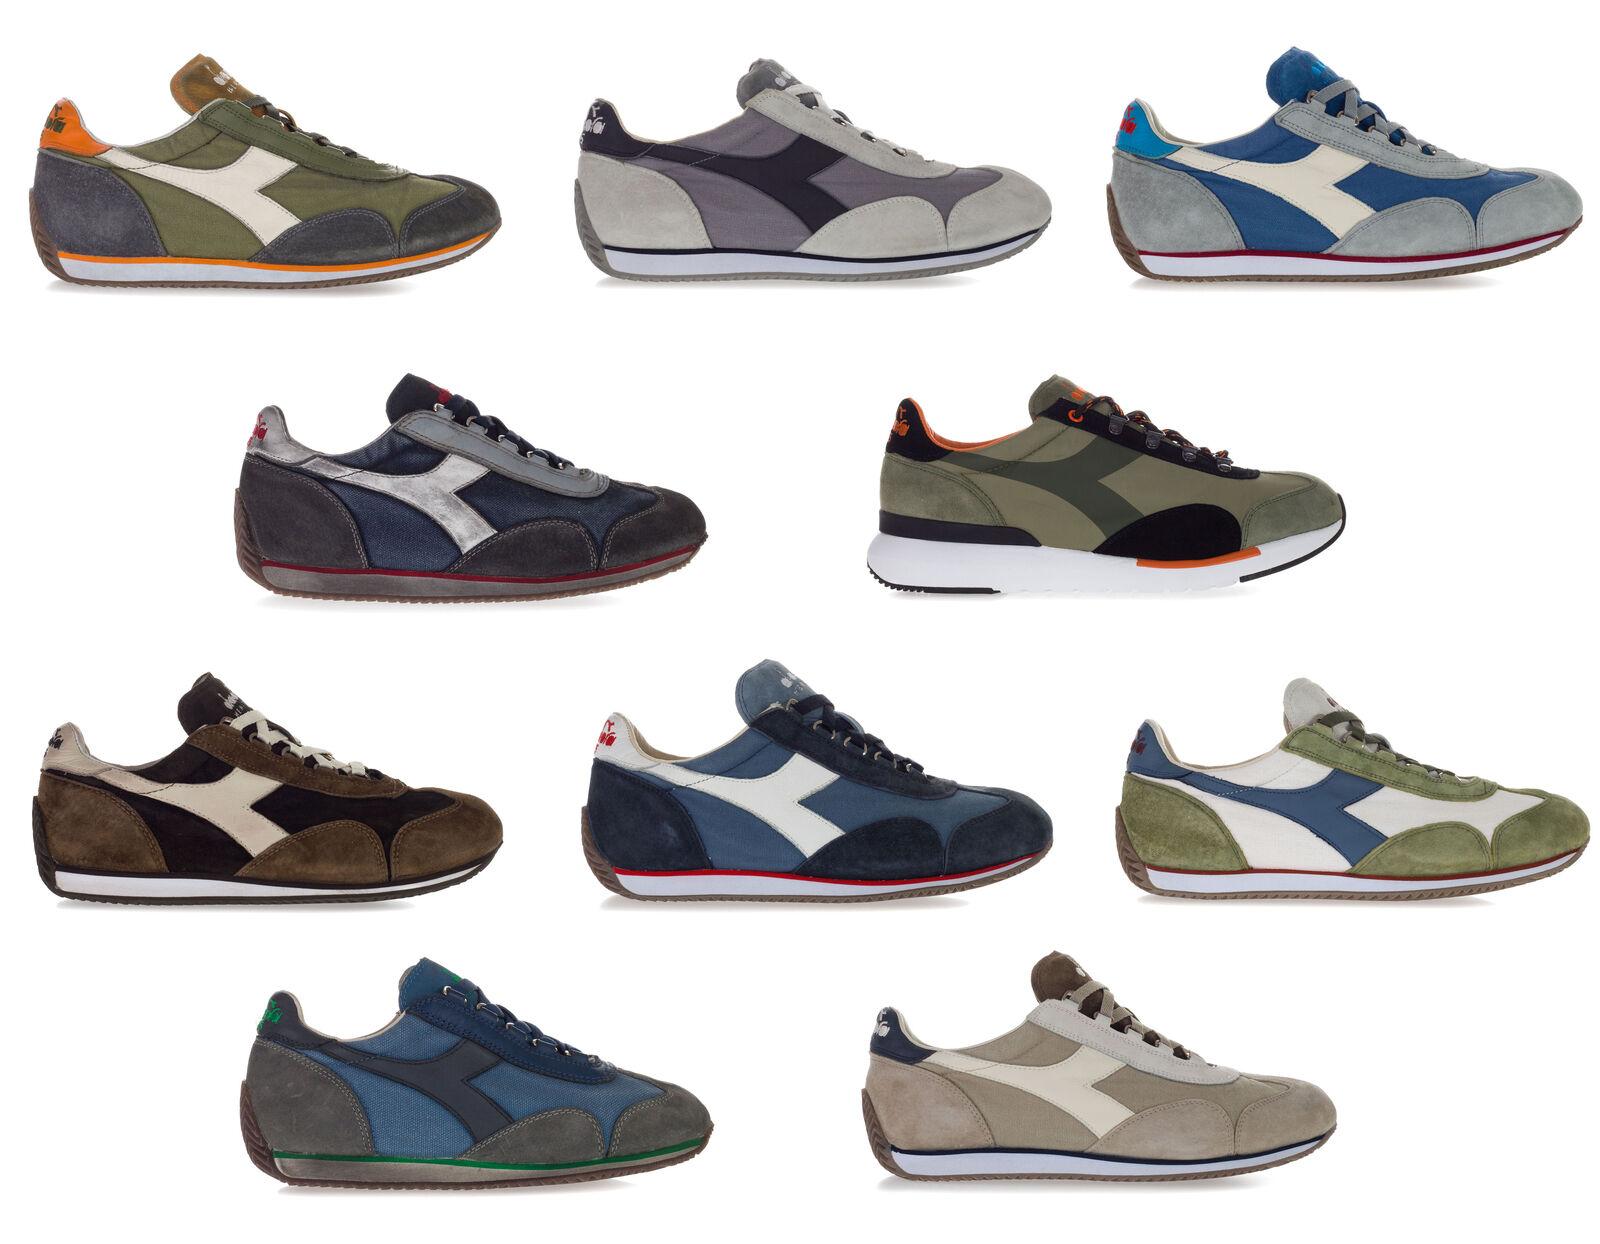 DIADORA HERITAGE Men's Women's EQUIPE Sneakers shoes STONE WASH 12 DIRTY 11 EVO